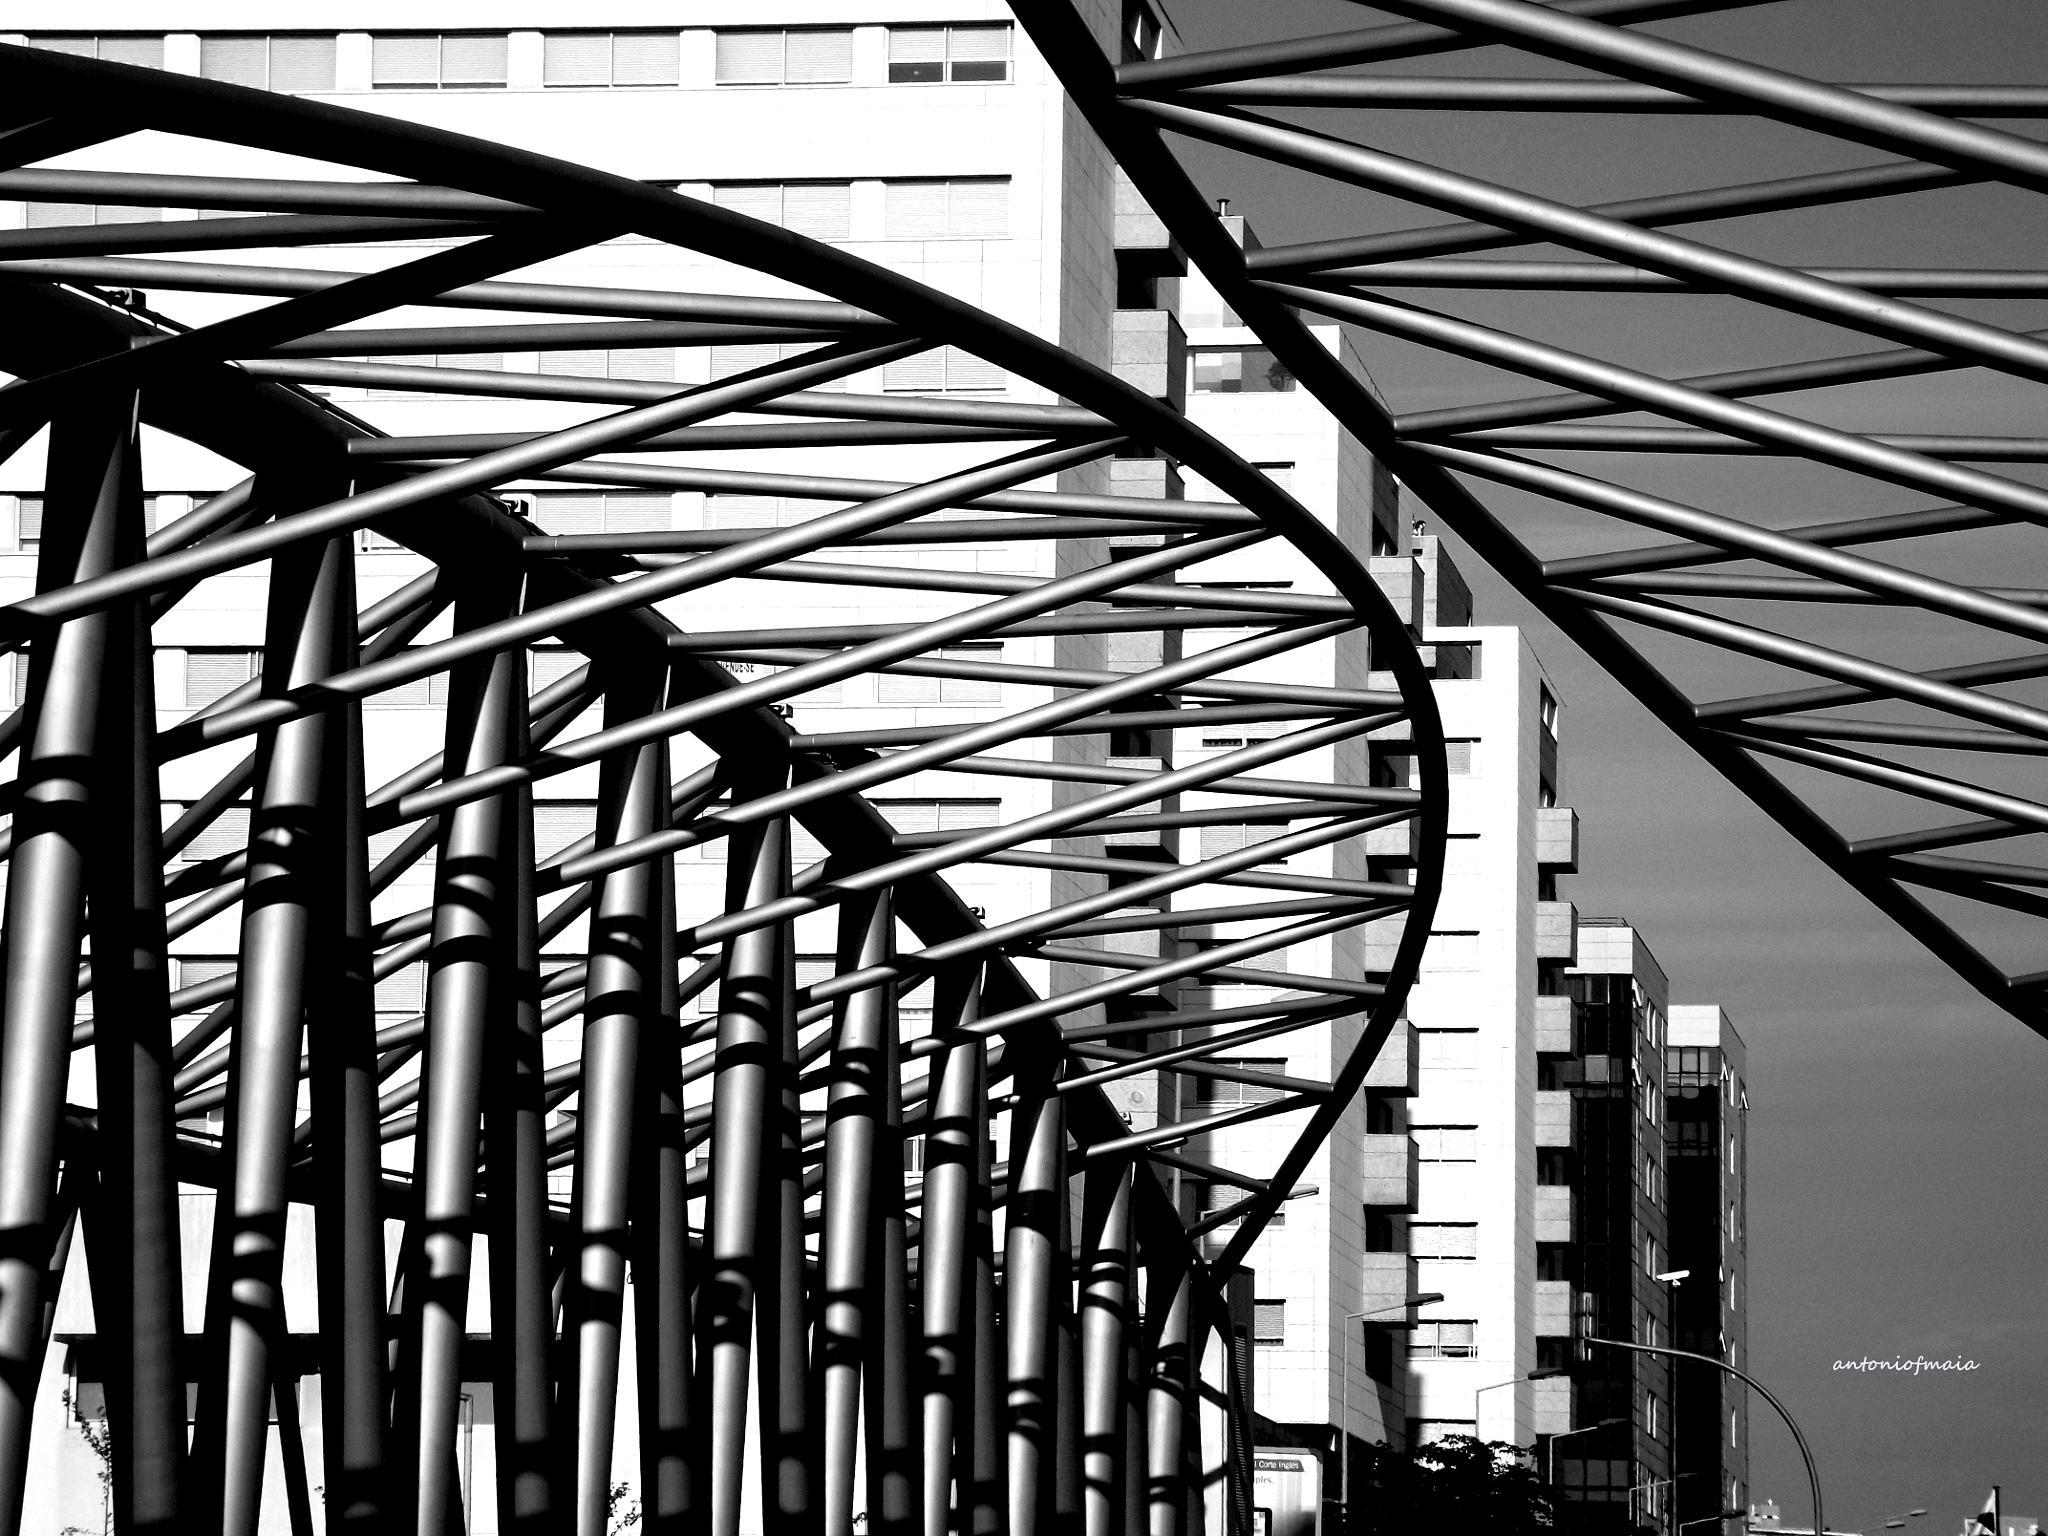 Geometries in the city... by Antonio F. Maia